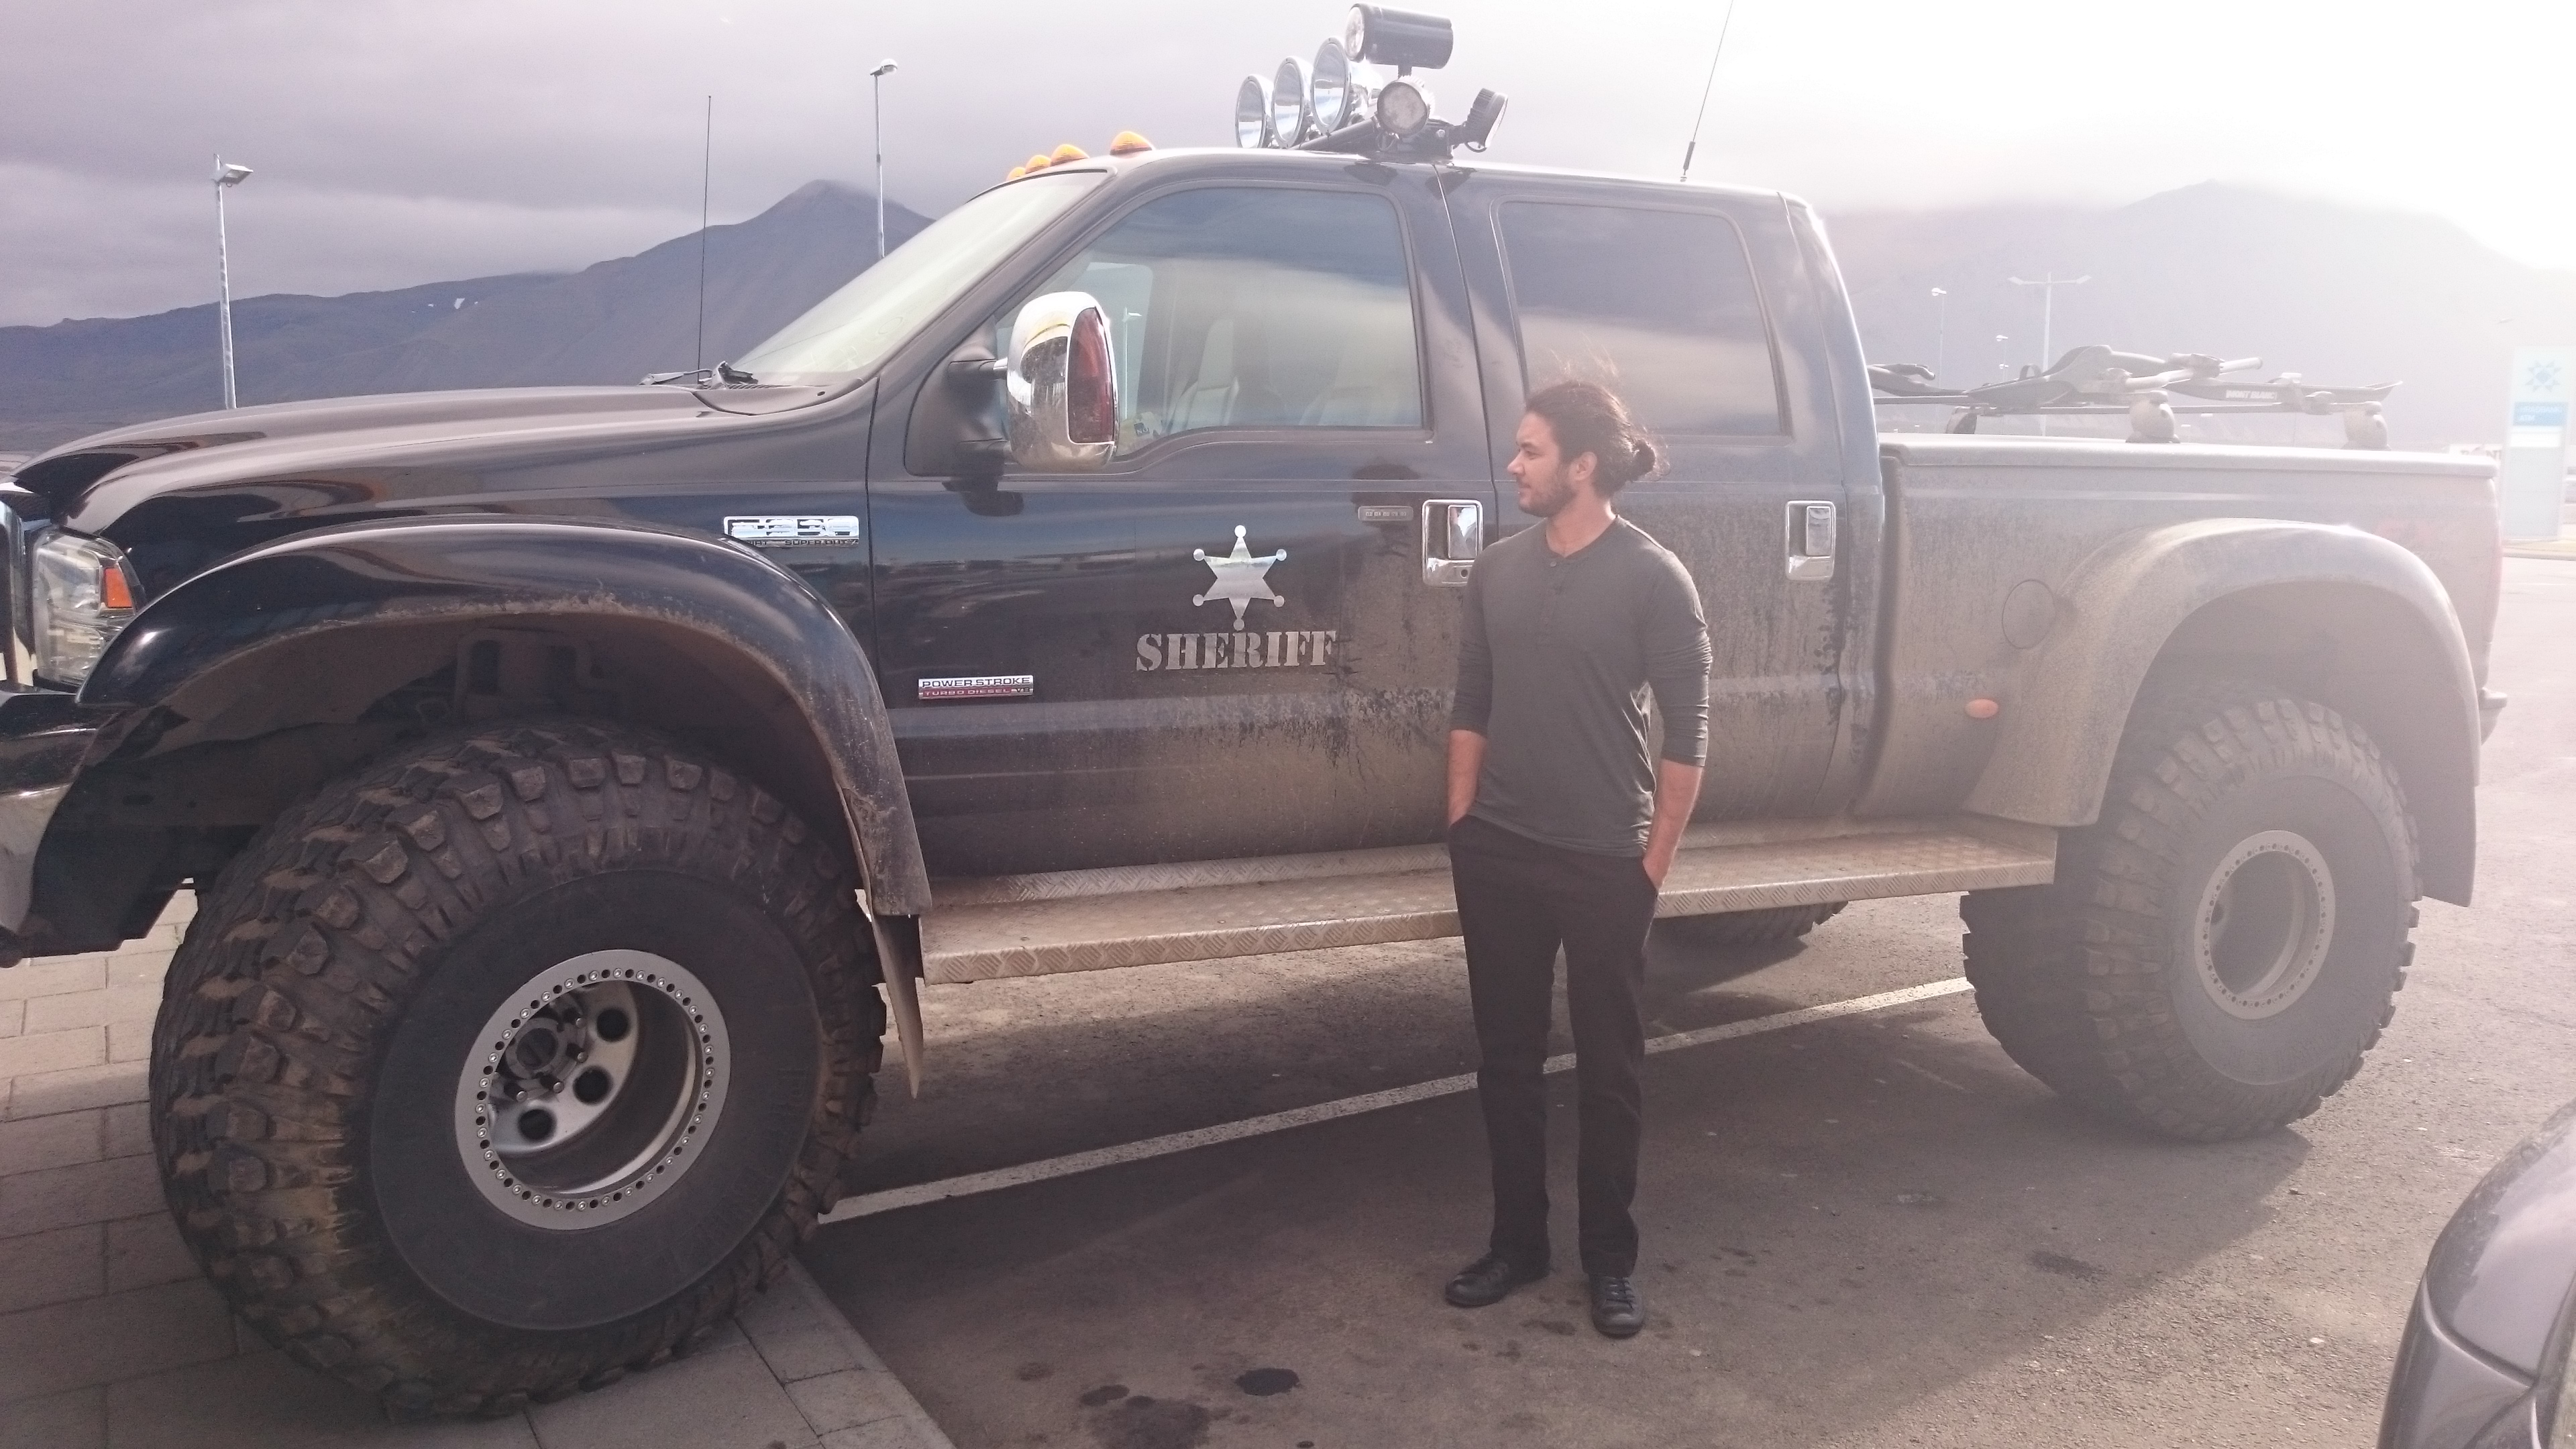 Sheriff's Truck